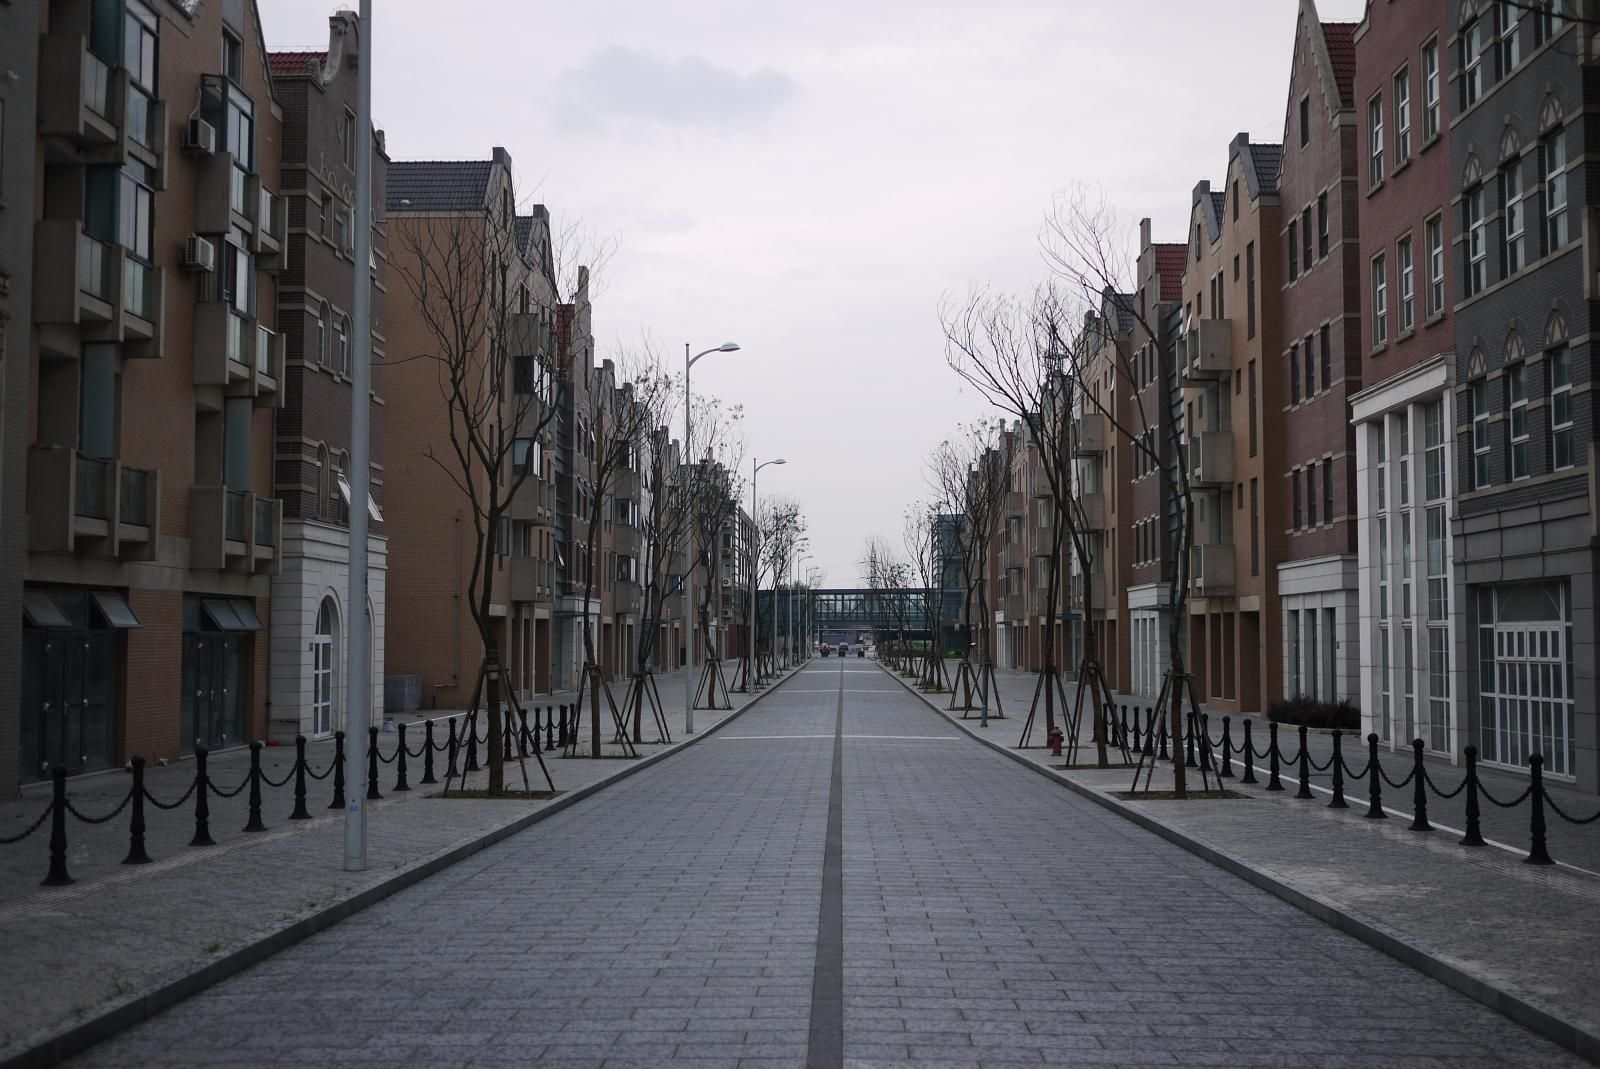 pin side street spanish - photo #38